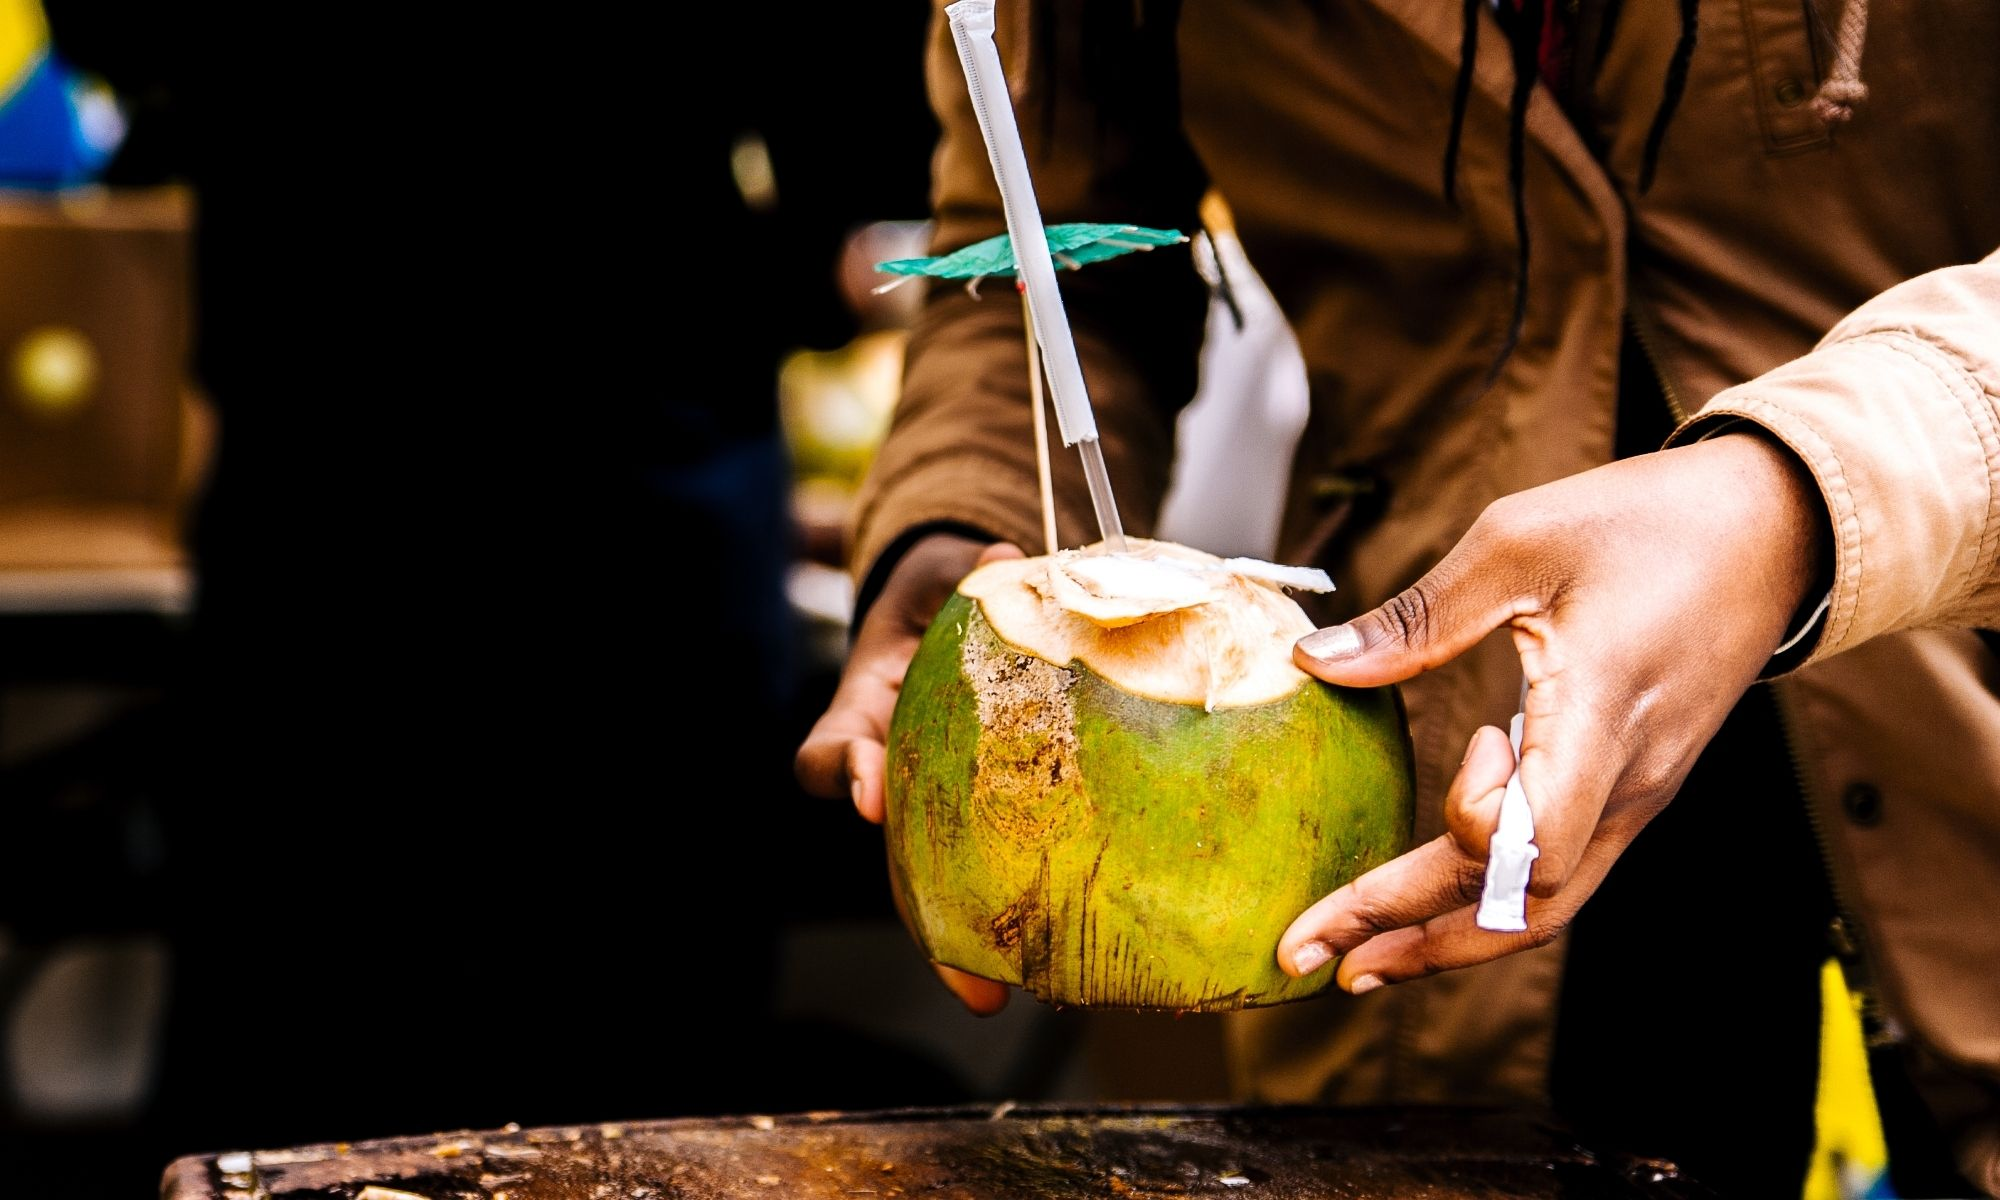 vender água de coco